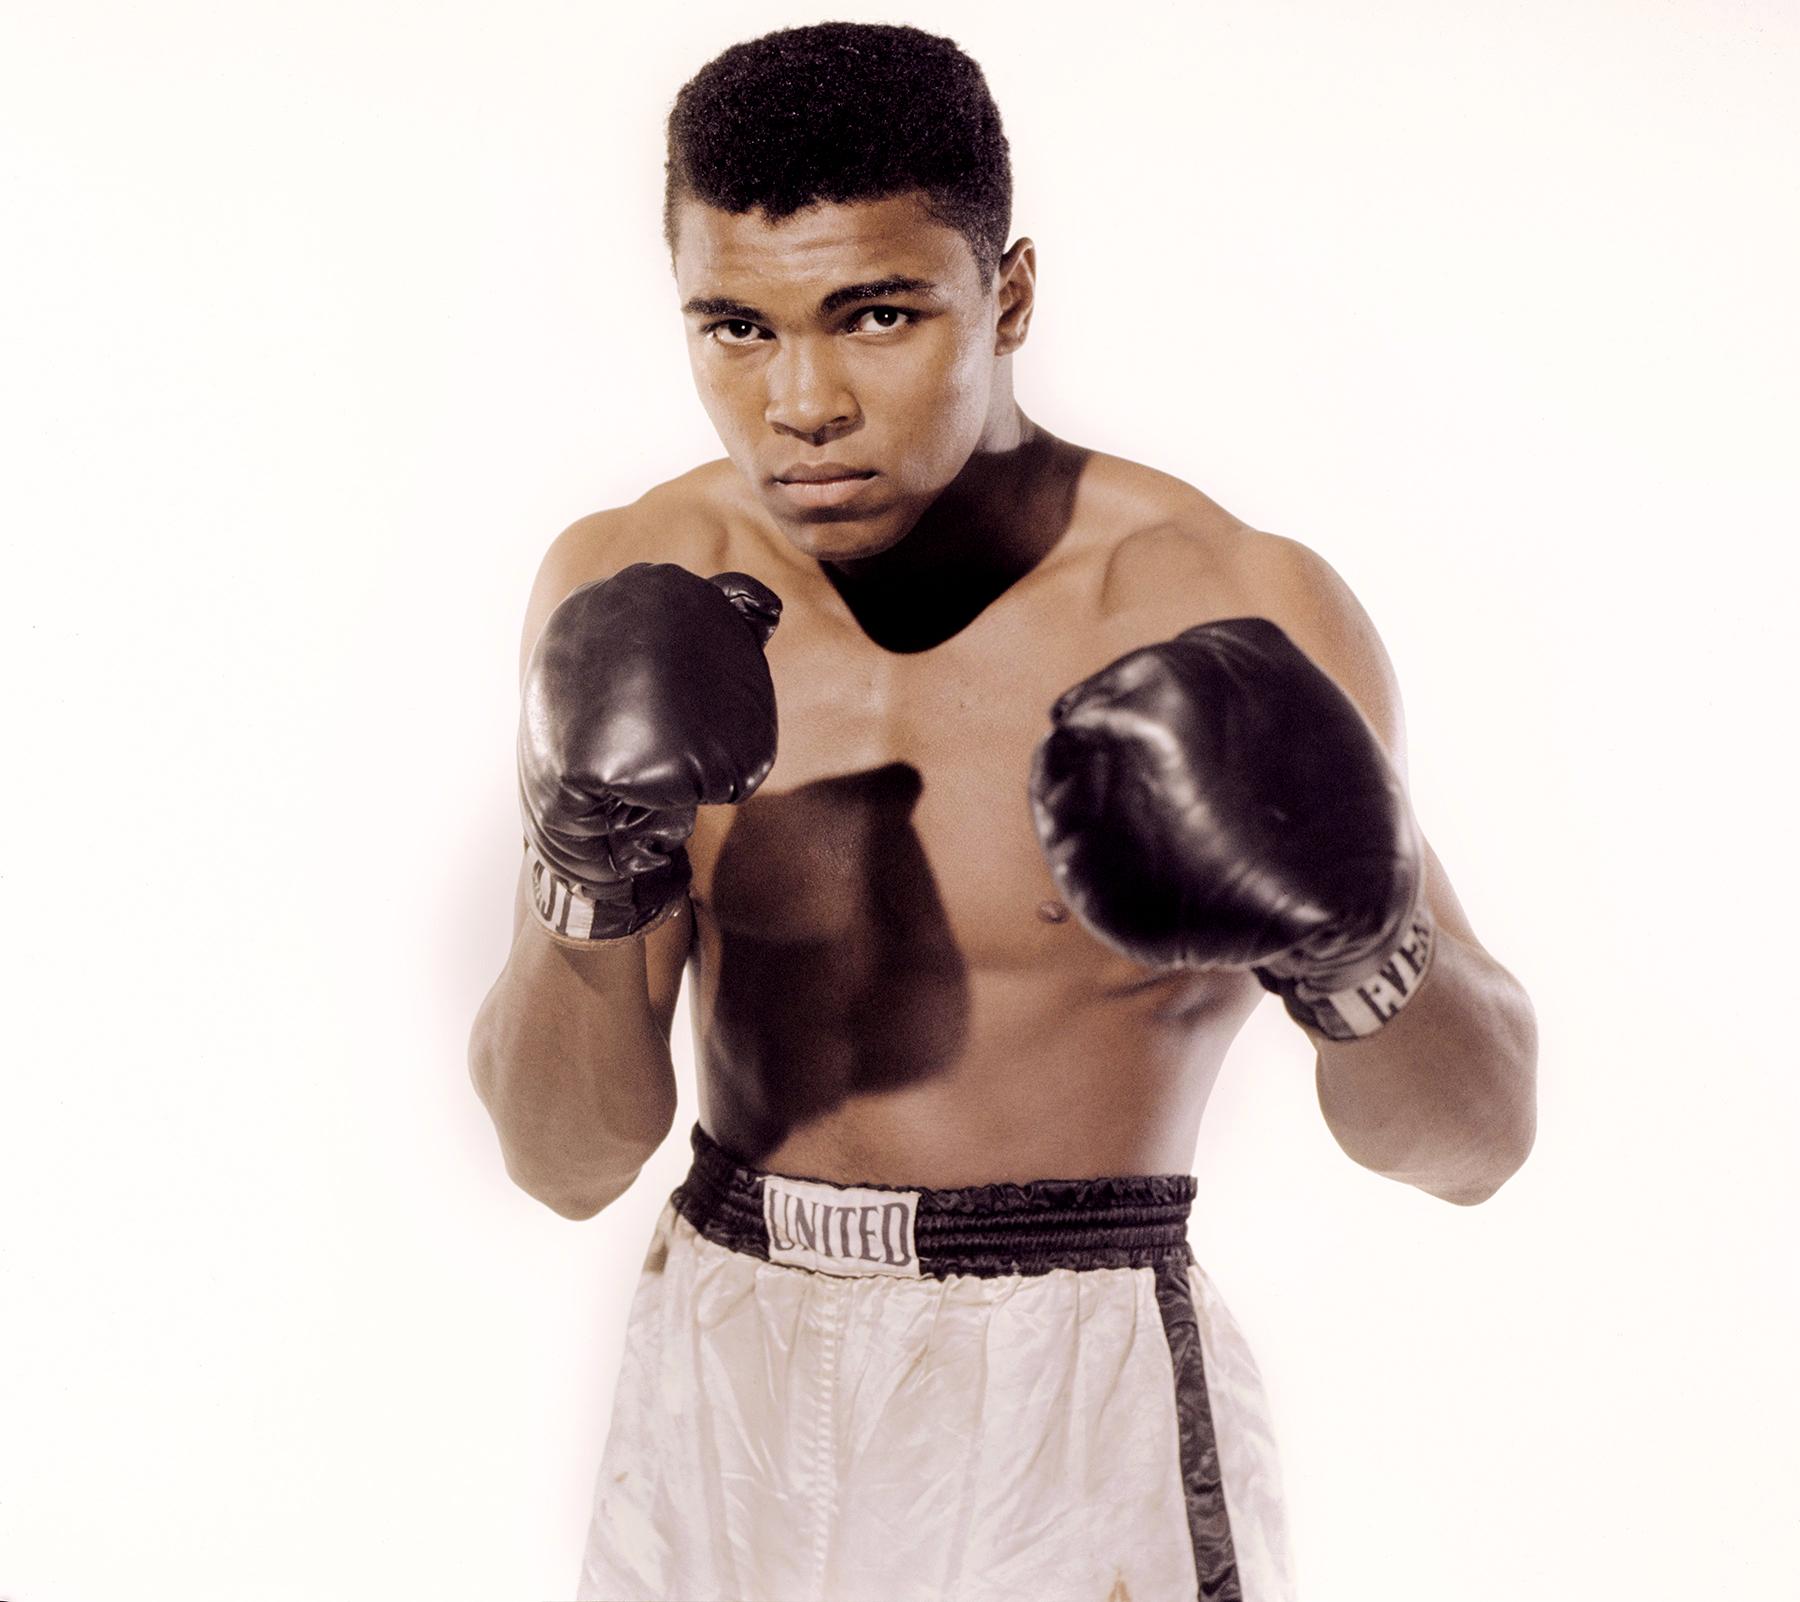 Muhammad Ali poses for the camera on May 17, 1962, in Long Island, NY.